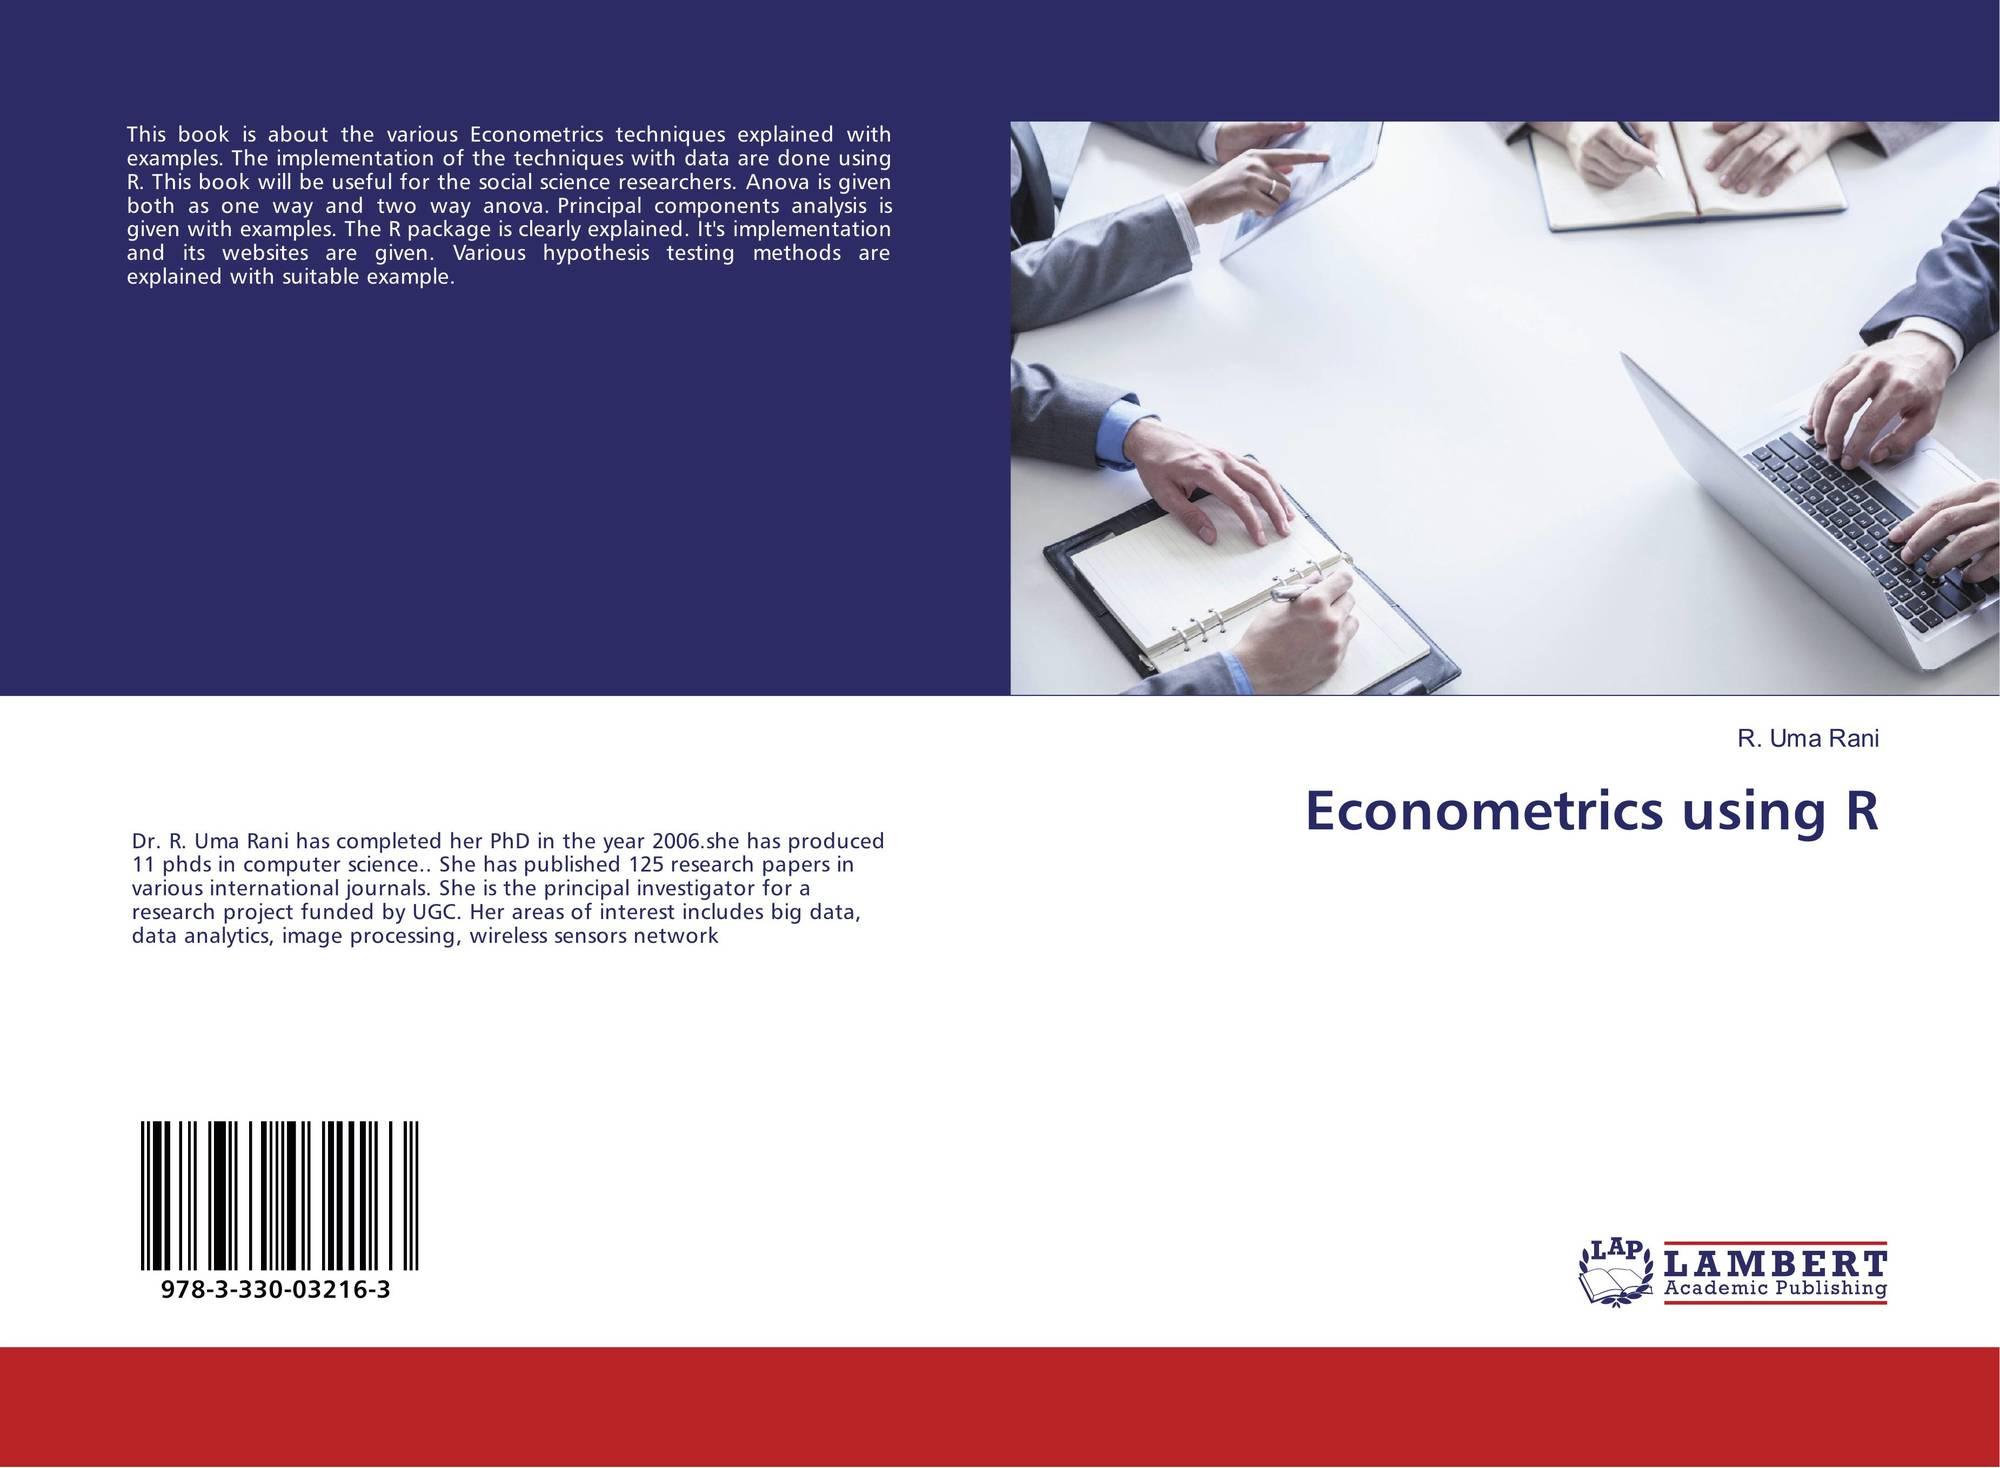 Econometrics using R, 978-3-330-03216-3, 3330032162